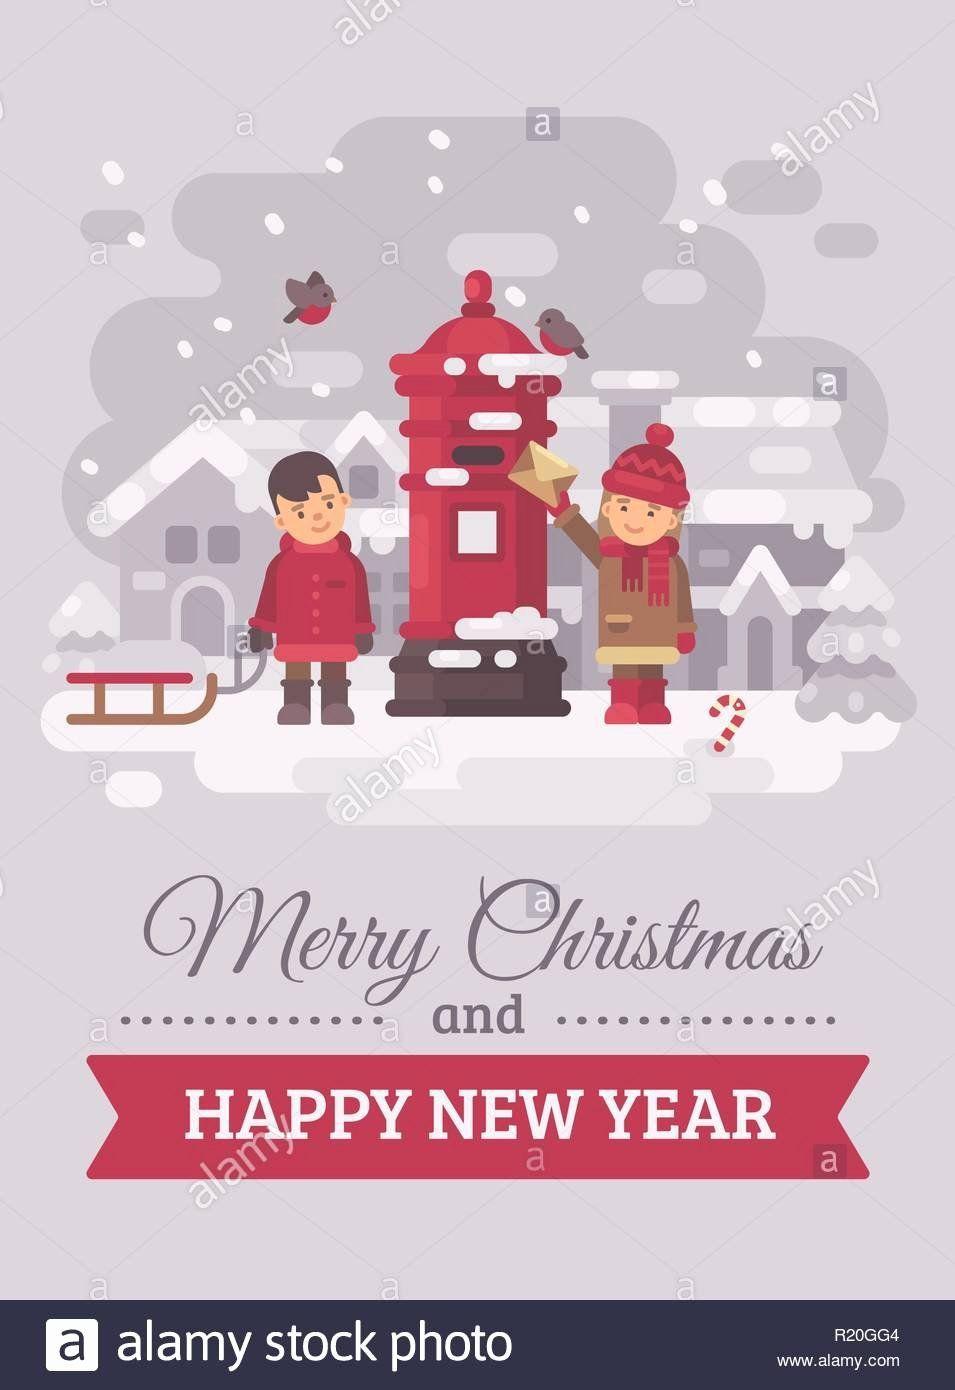 Silent Night Christmas Cards Awesome Christmas Card With Town Stock S Christmas Card With Town Silent Night Christmas Cards Christmas Card Template